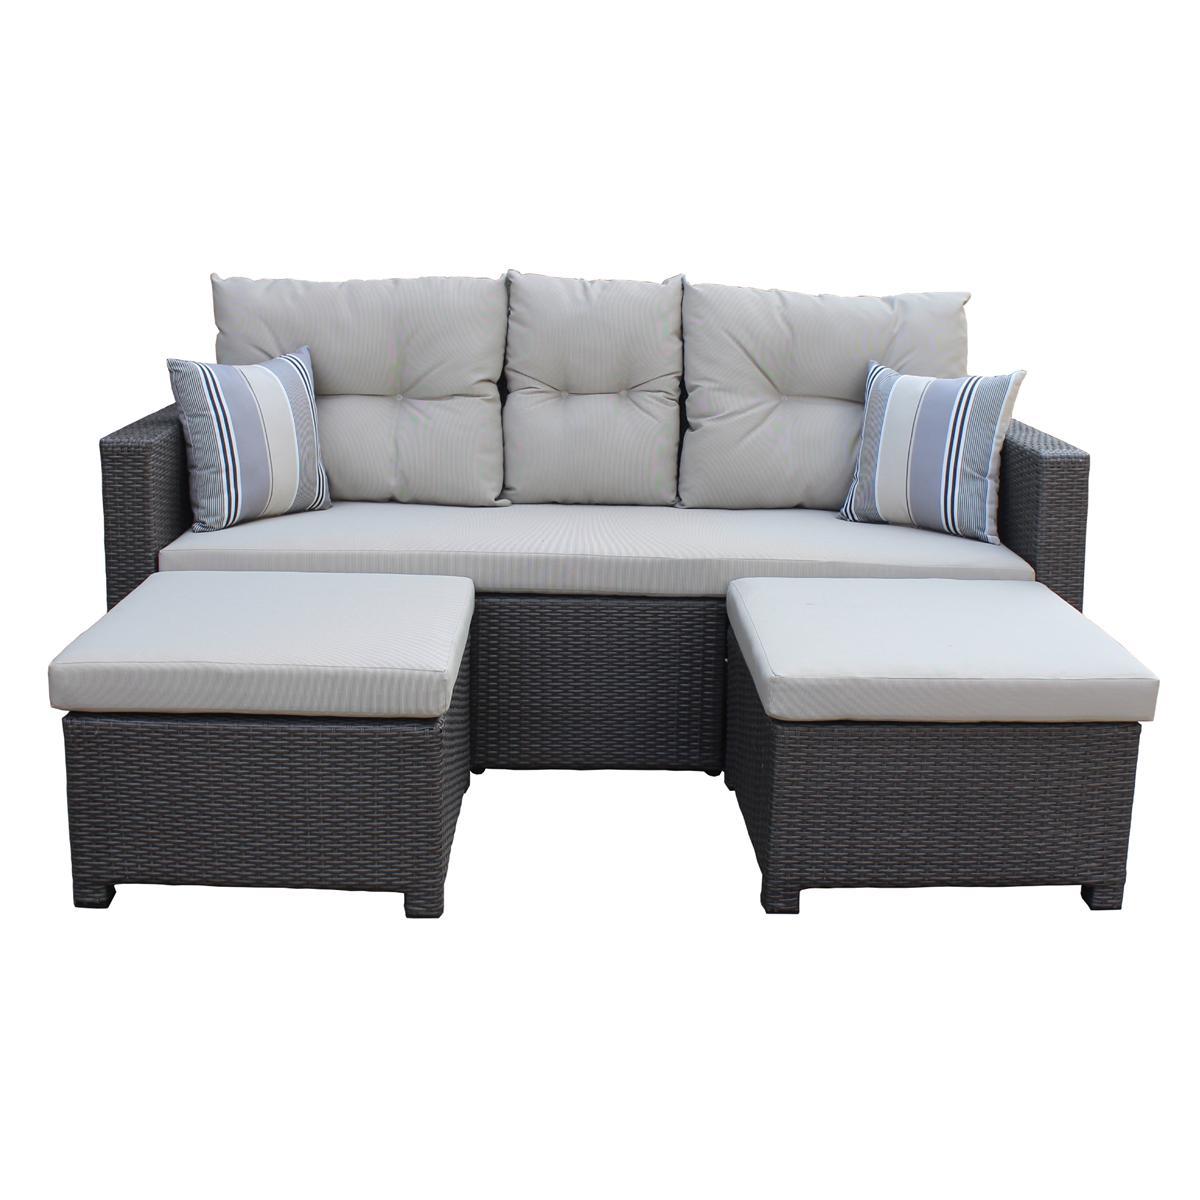 Full Size of Polyrattan Sofa Lounge Rattan Outdoor Tchibo 2 Sitzer Grau Couch Ausziehbar Set 2 Sitzer Balkon Gartensofa Garden Exterior Love Rotin Design Tom Tailor Sofa Polyrattan Sofa